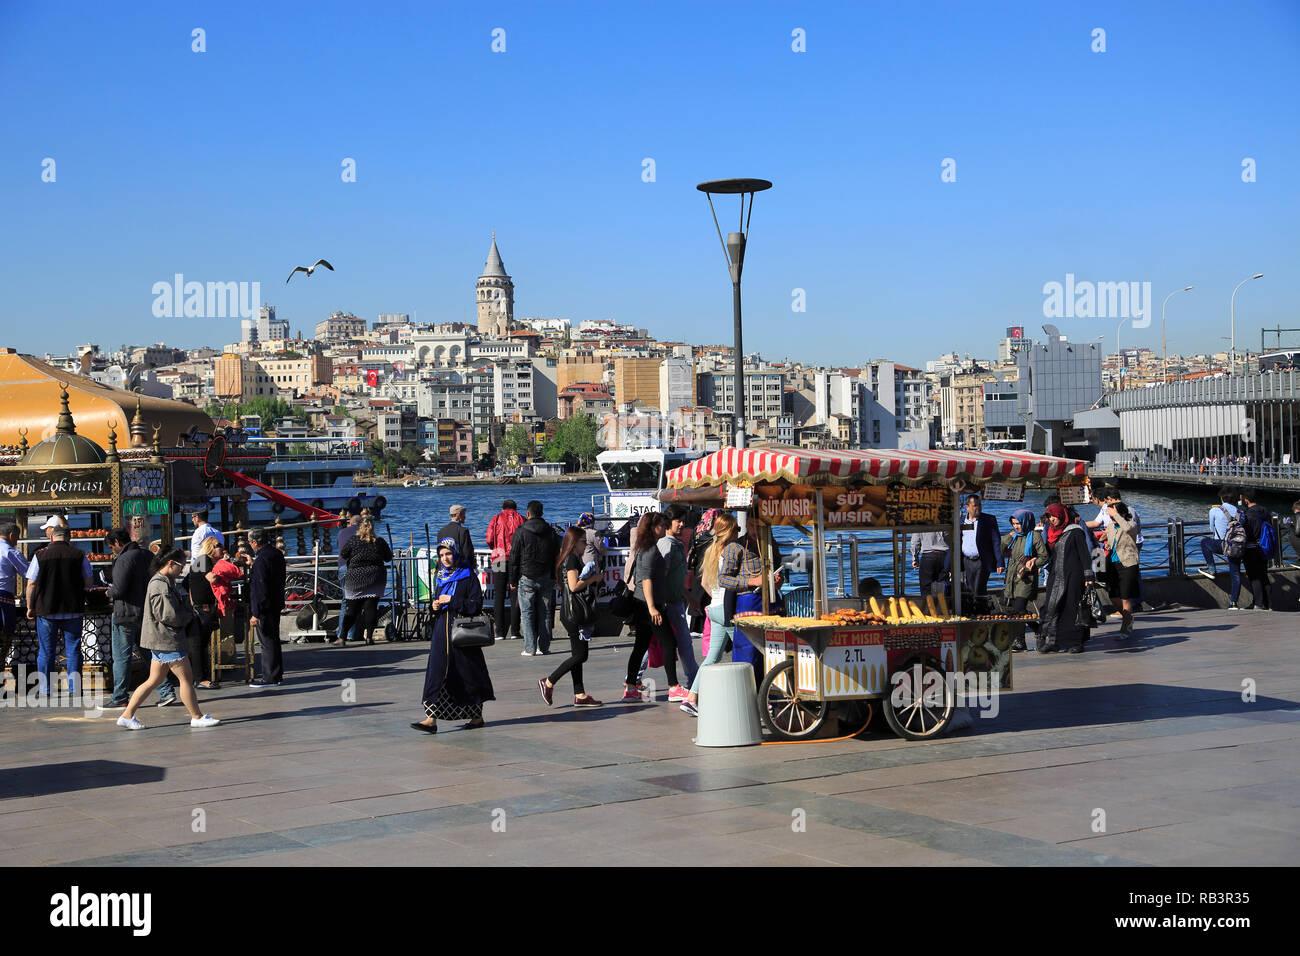 Eminonu, Galata Tower, Golden Horn, Bosphorus, Istanbul, Turkey, Europe - Stock Image